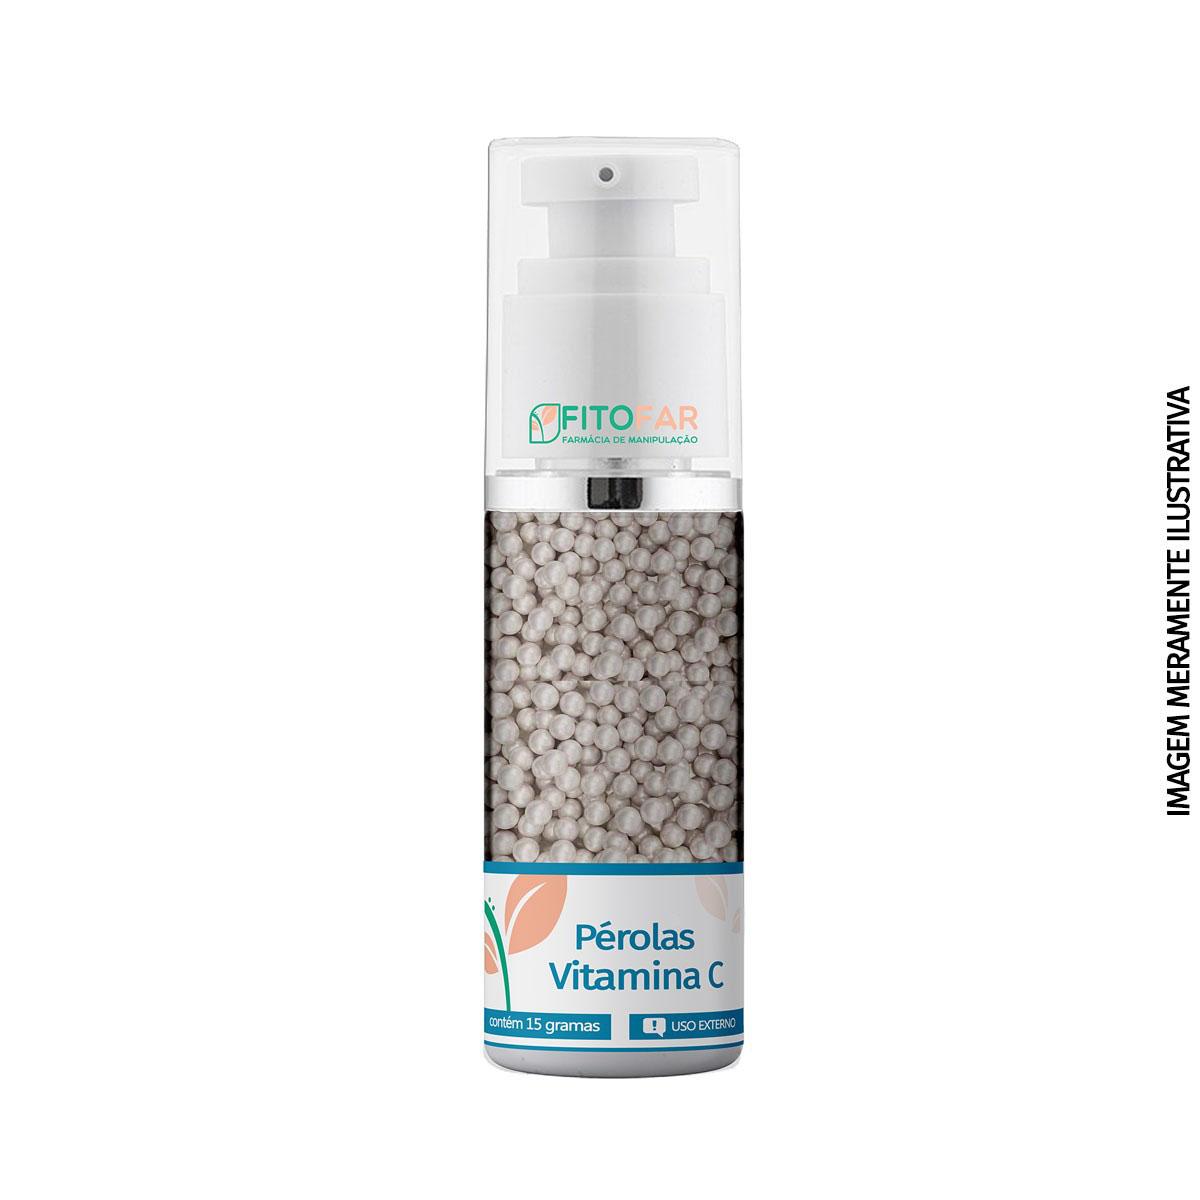 Nano Perolas - Vitamina C - 15 g